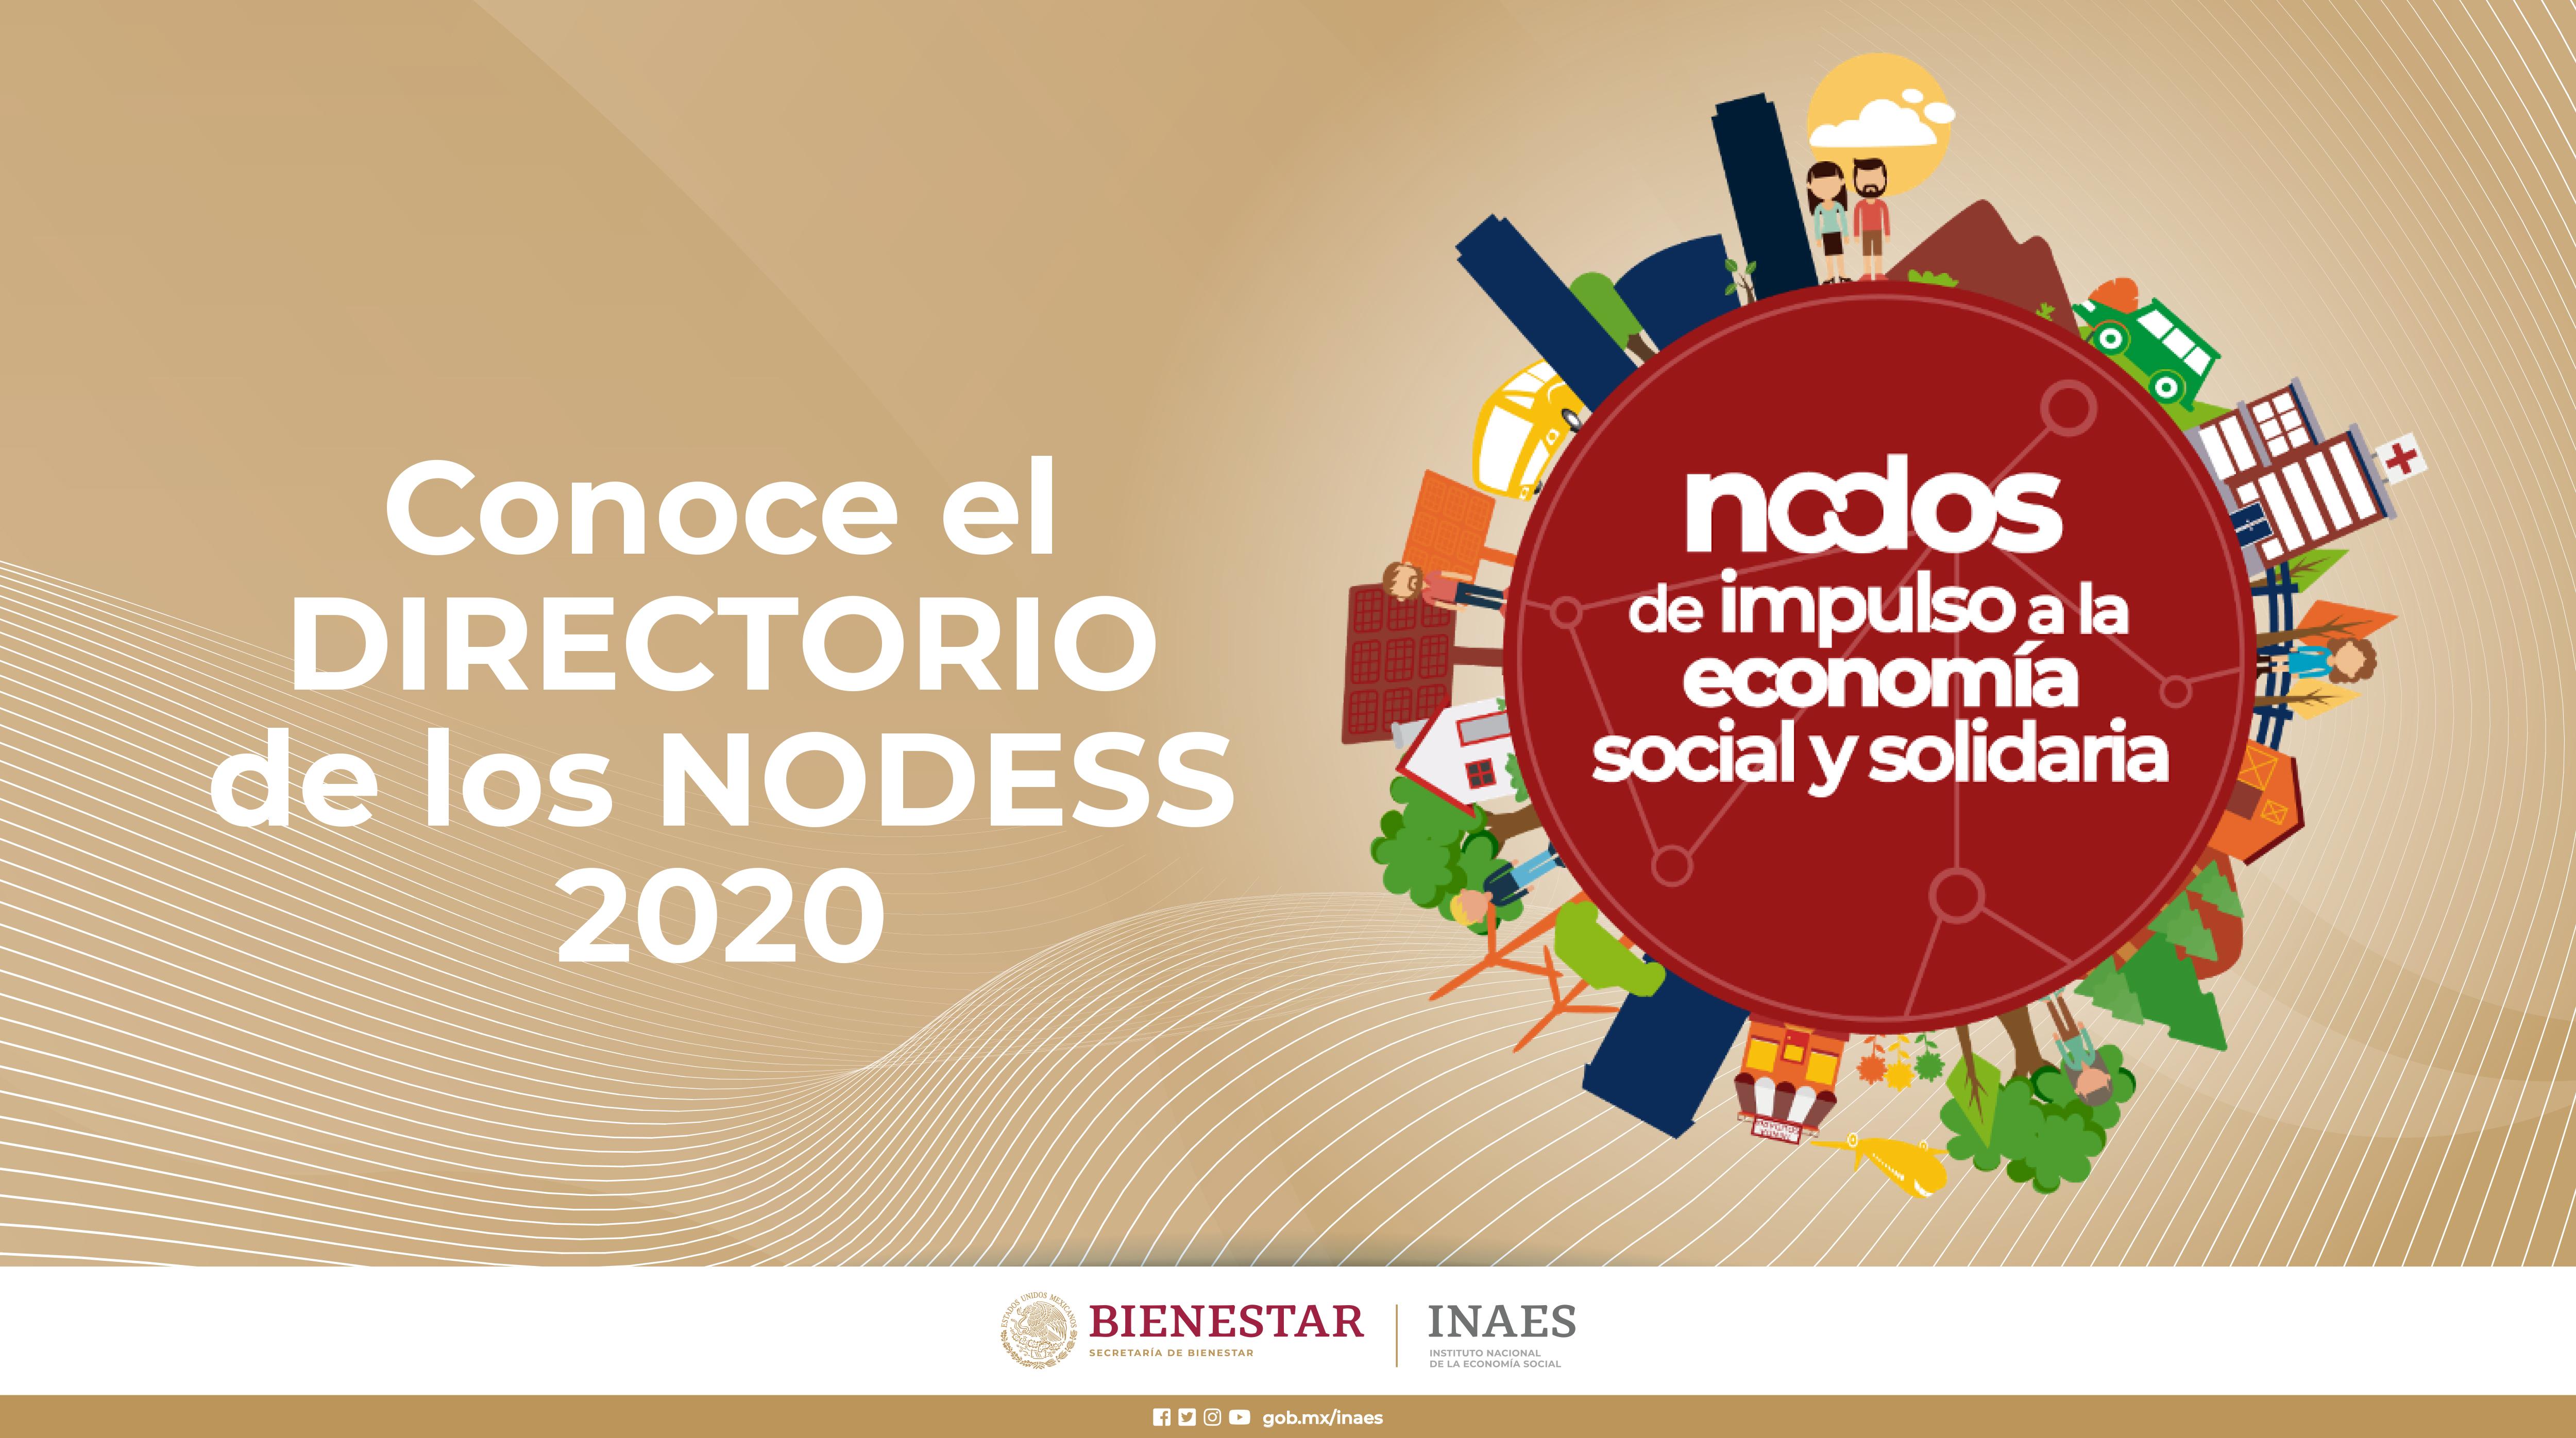 NODESS 2020